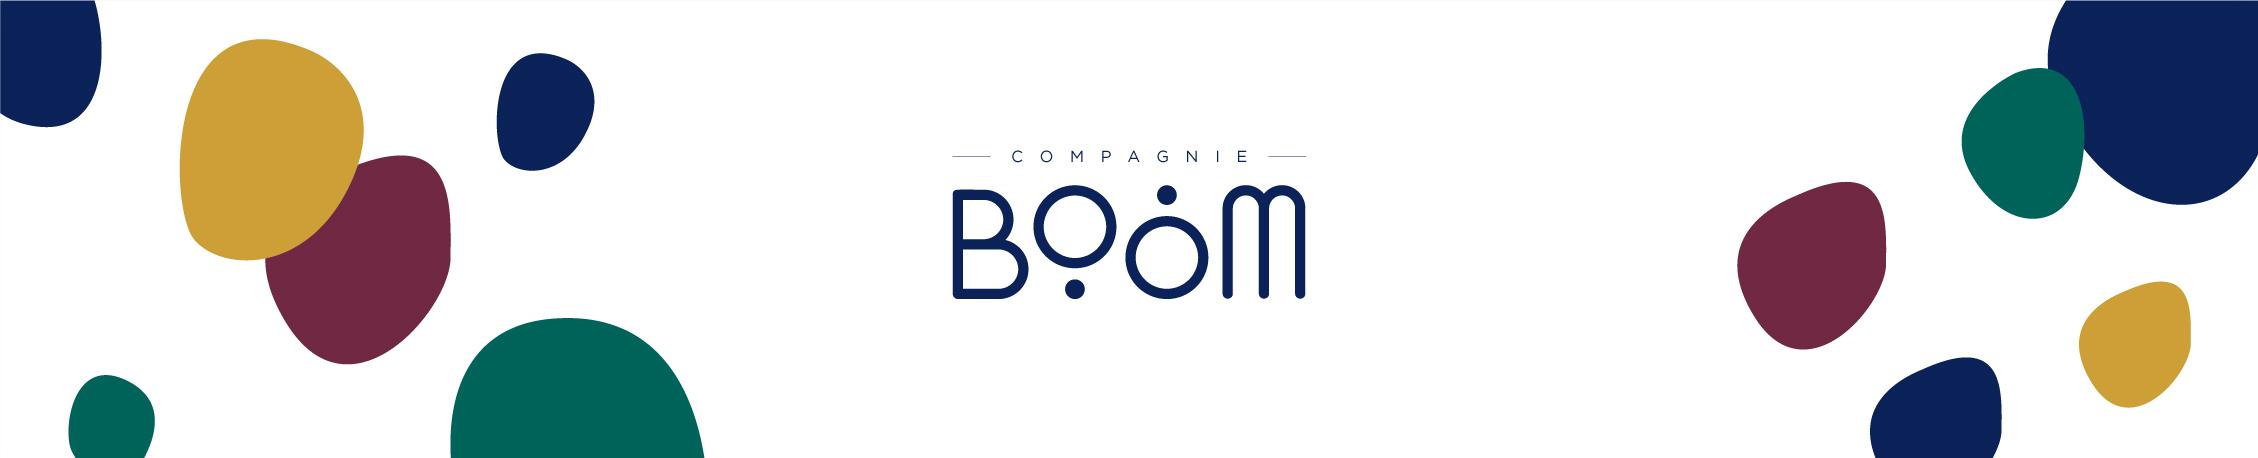 Compagnie BOOM Logo